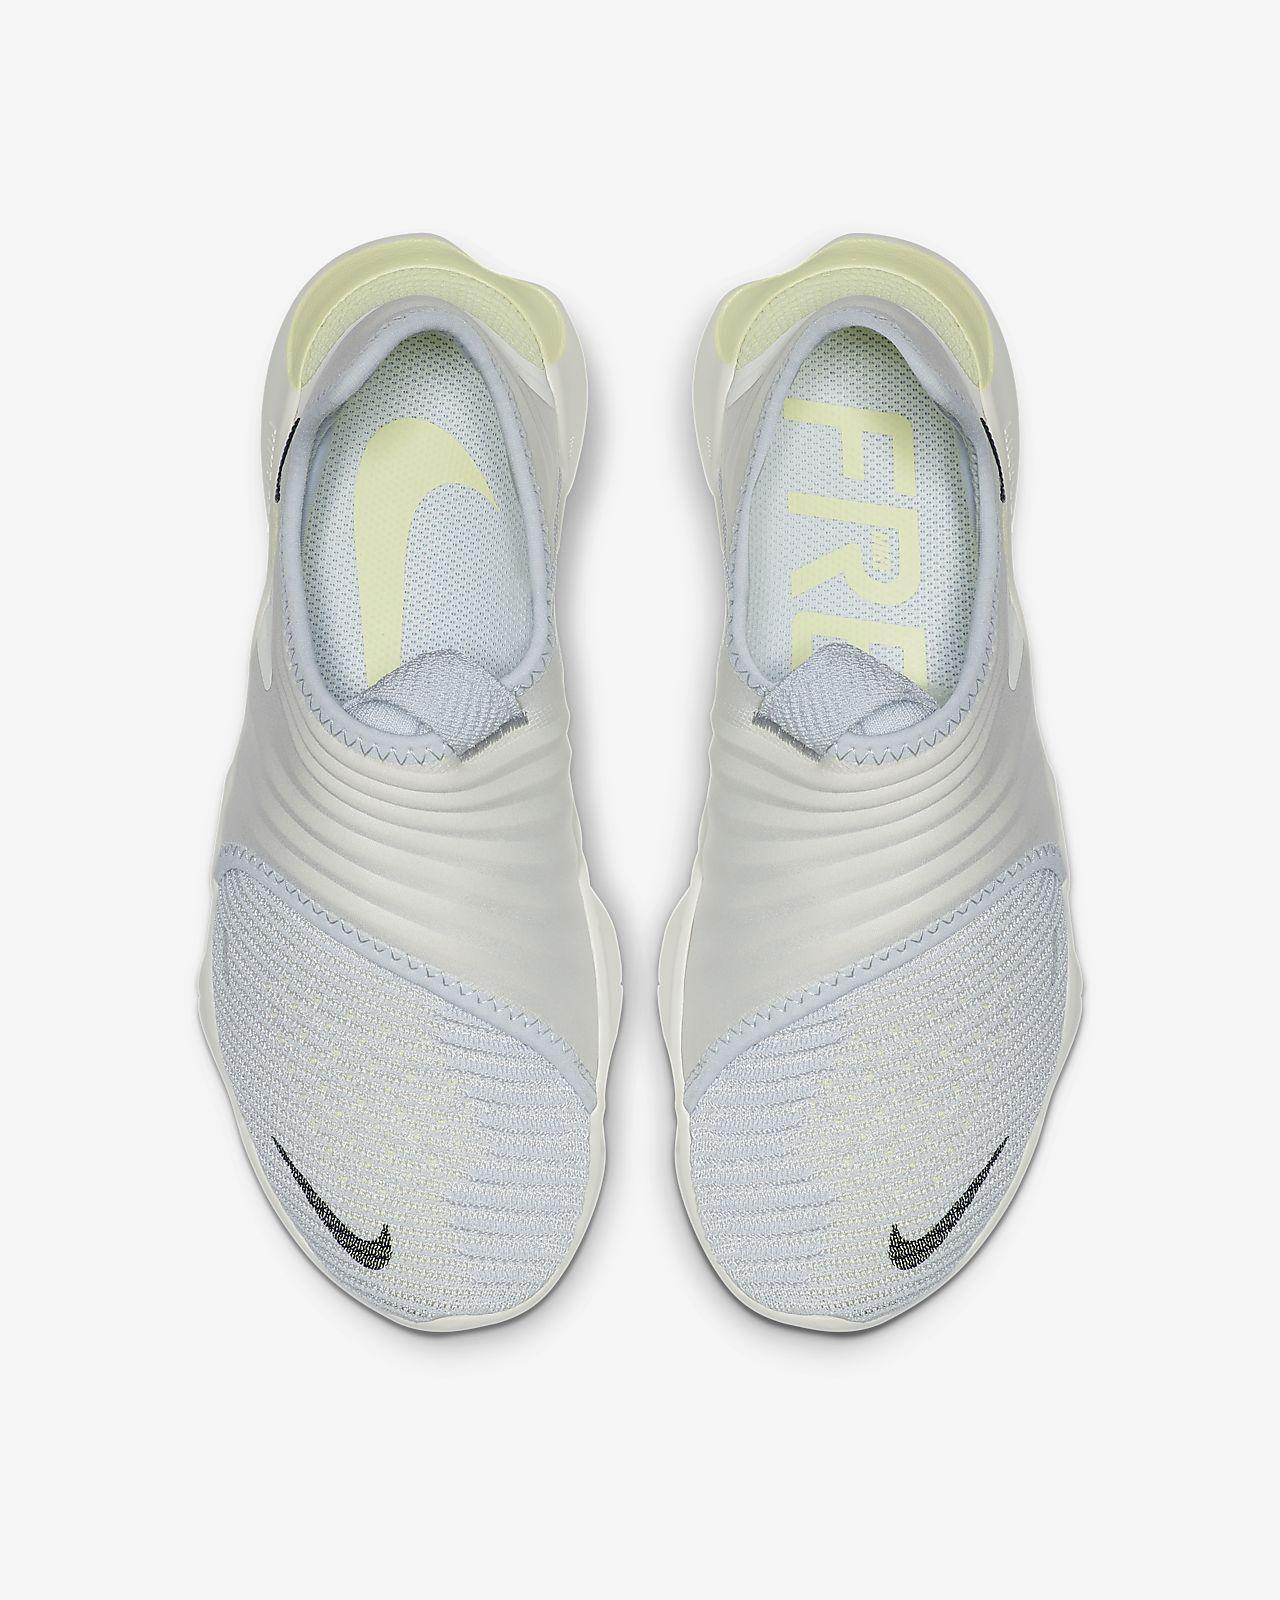 5fe3fca35c8de Nike Free RN Flyknit 3.0 Women s Running Shoe. Nike.com GB